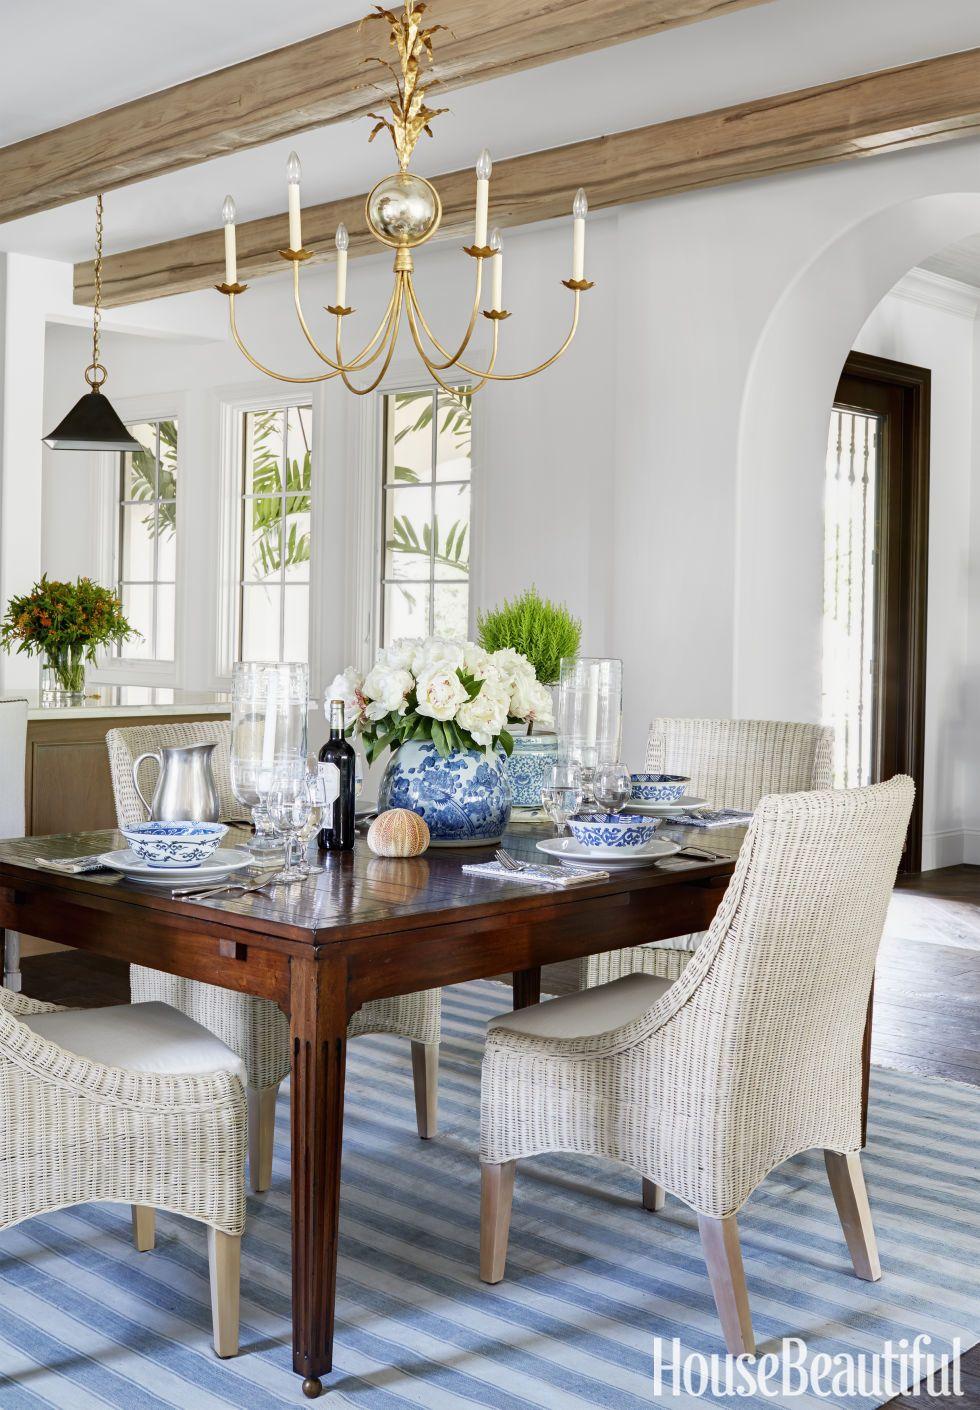 Ess Zimmer Interieur Design - Lounge Sessel | Lounge Sessel ...